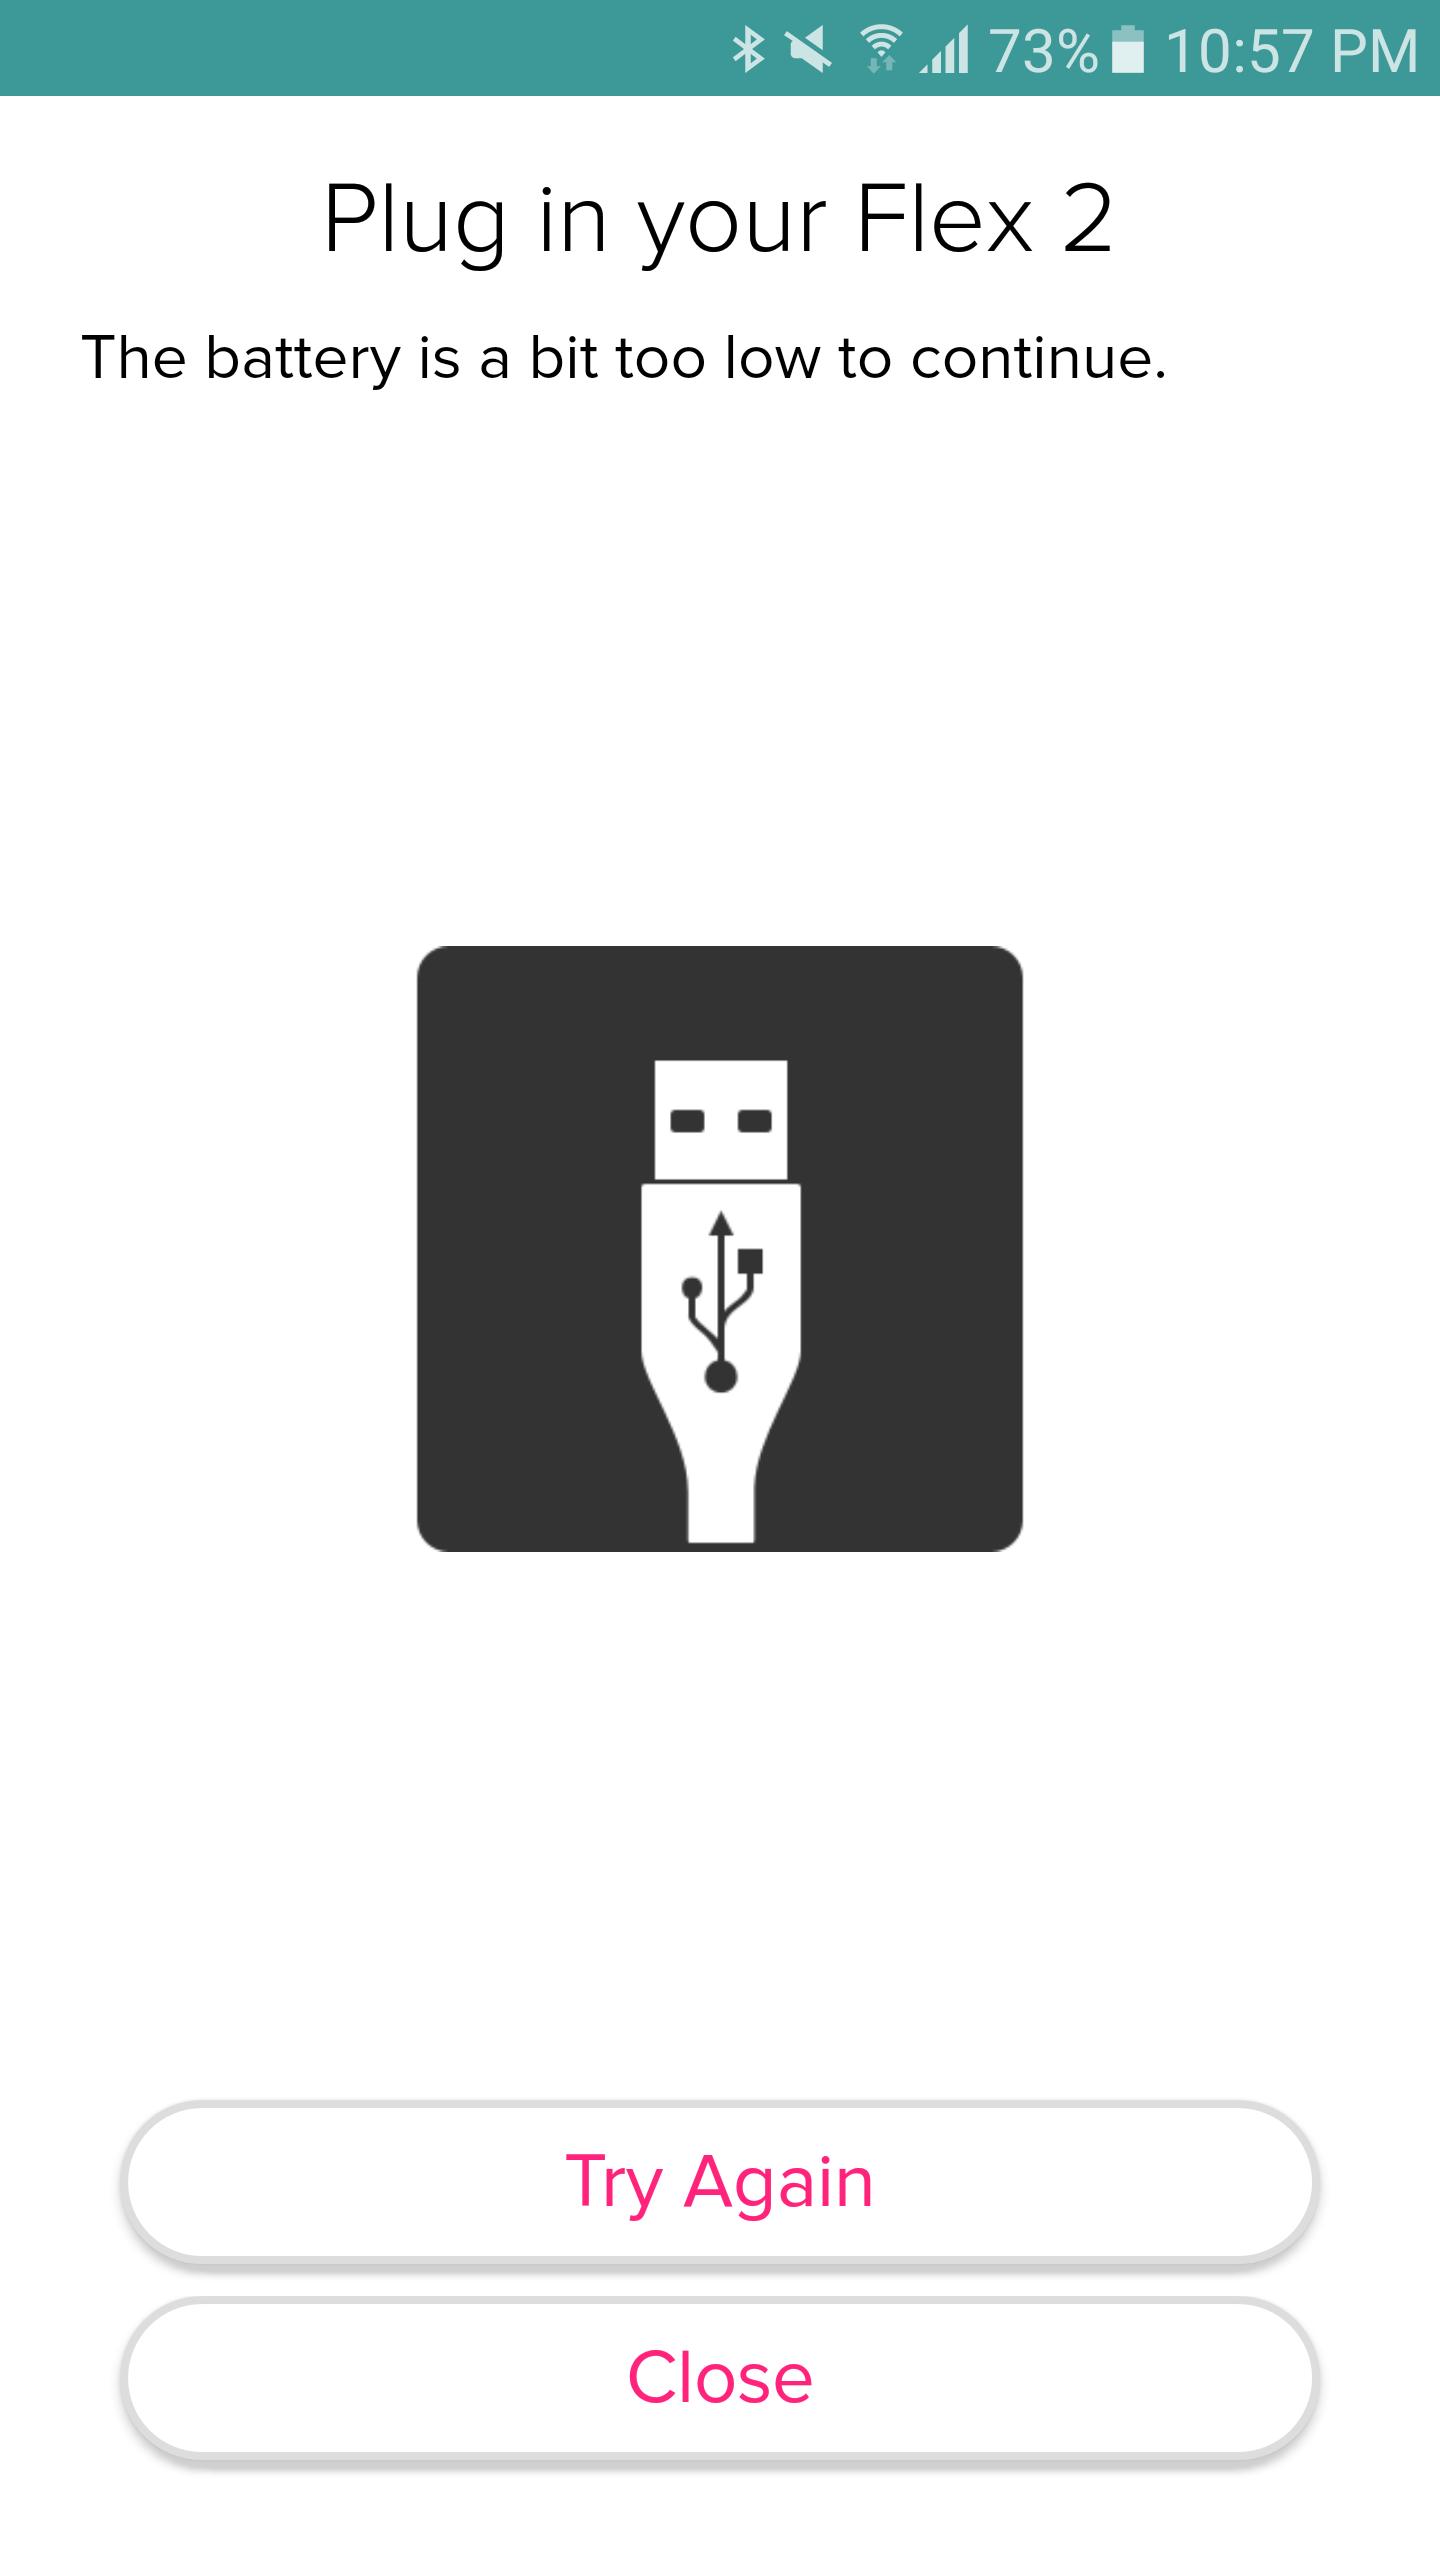 fitbit-flex2-app-setup-7